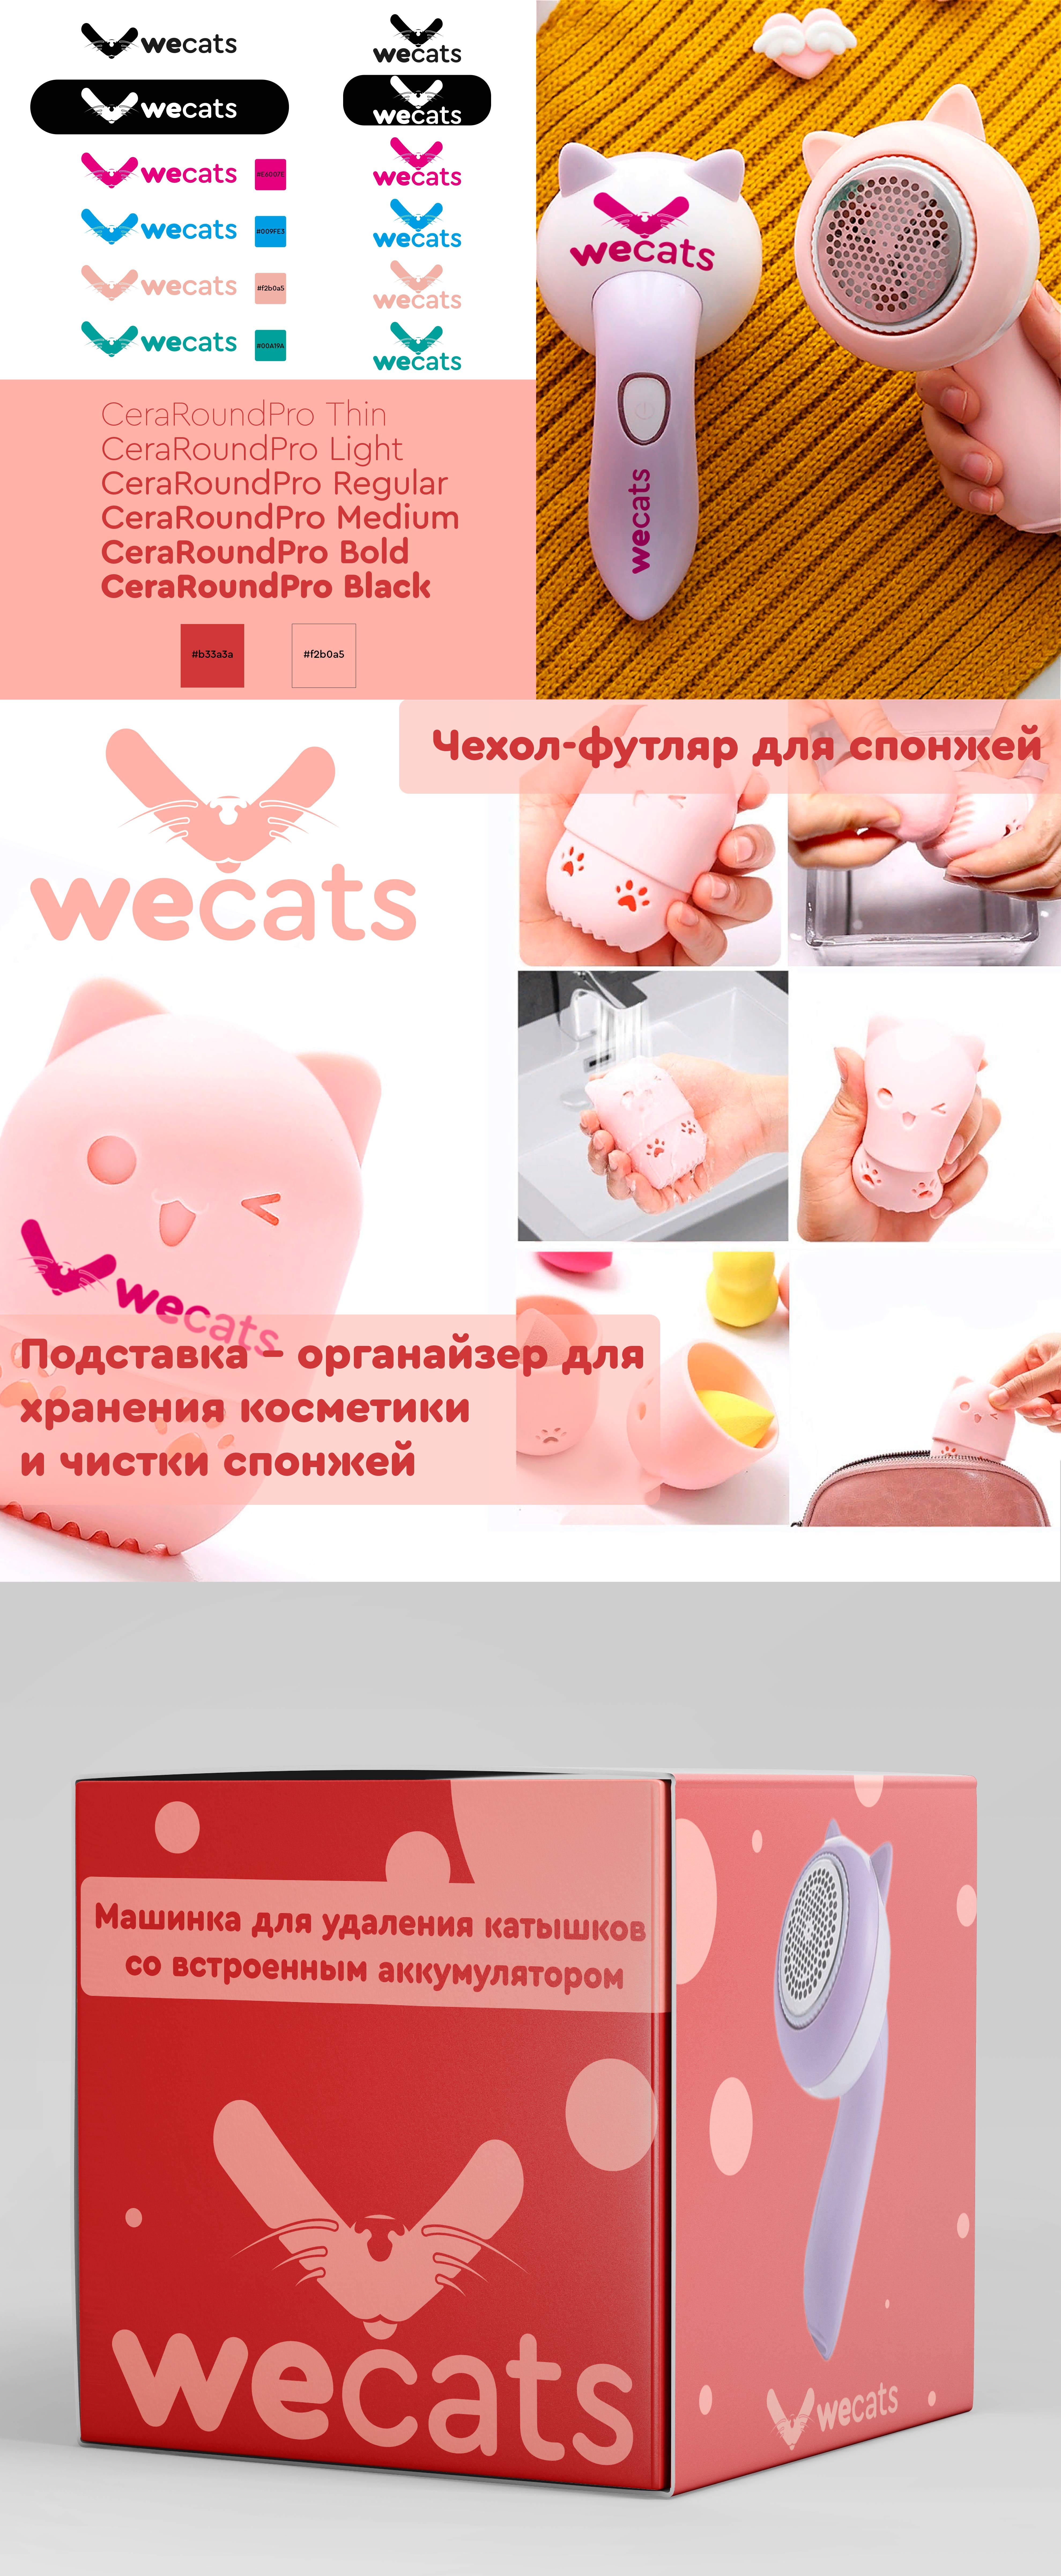 Создание логотипа WeCats фото f_9495f19130bb5bd1.jpg